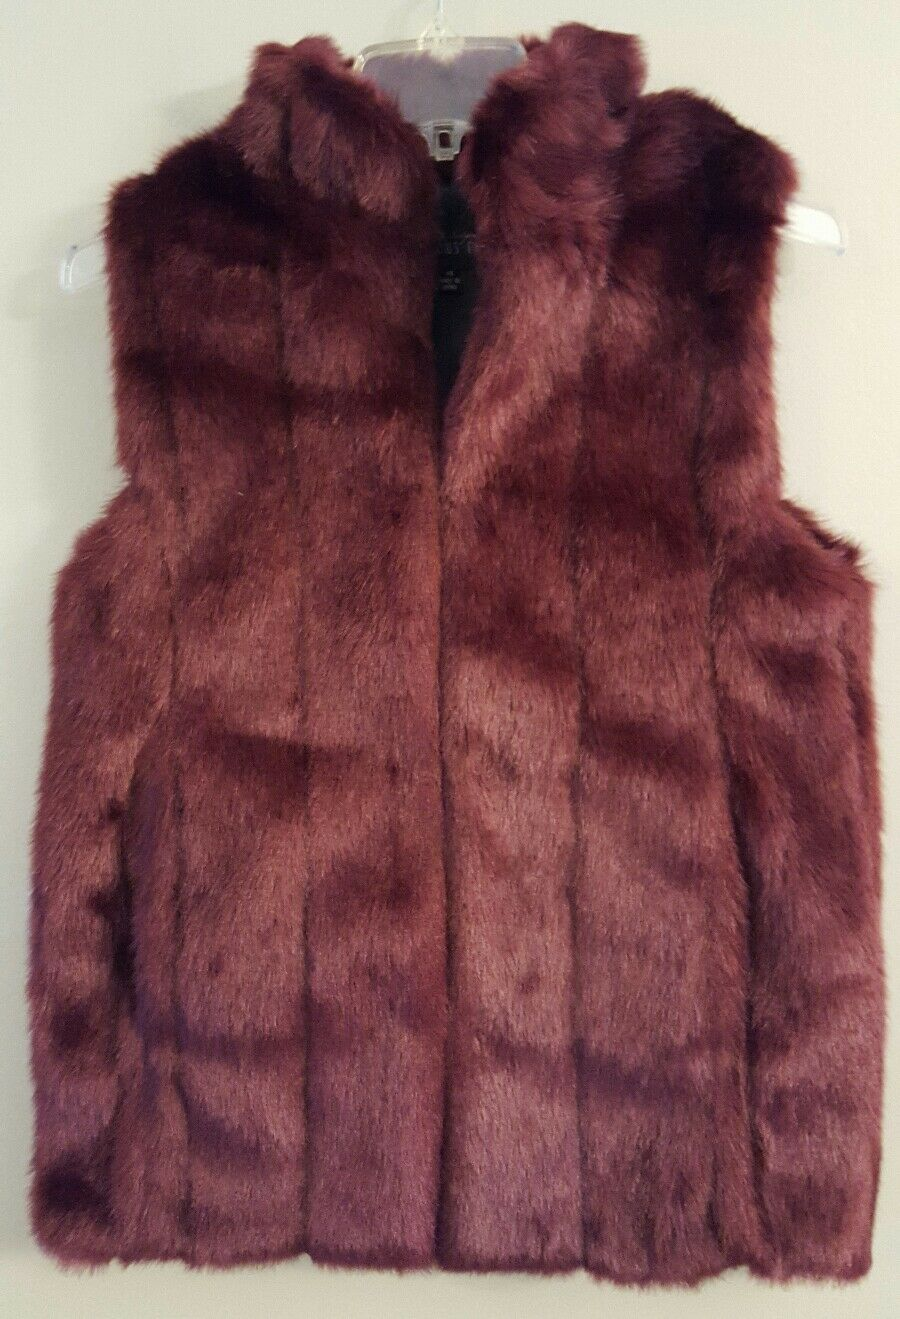 NWT FABULOUS FURS Mink Faux Fur Hook Vest XSMALL Burgundy